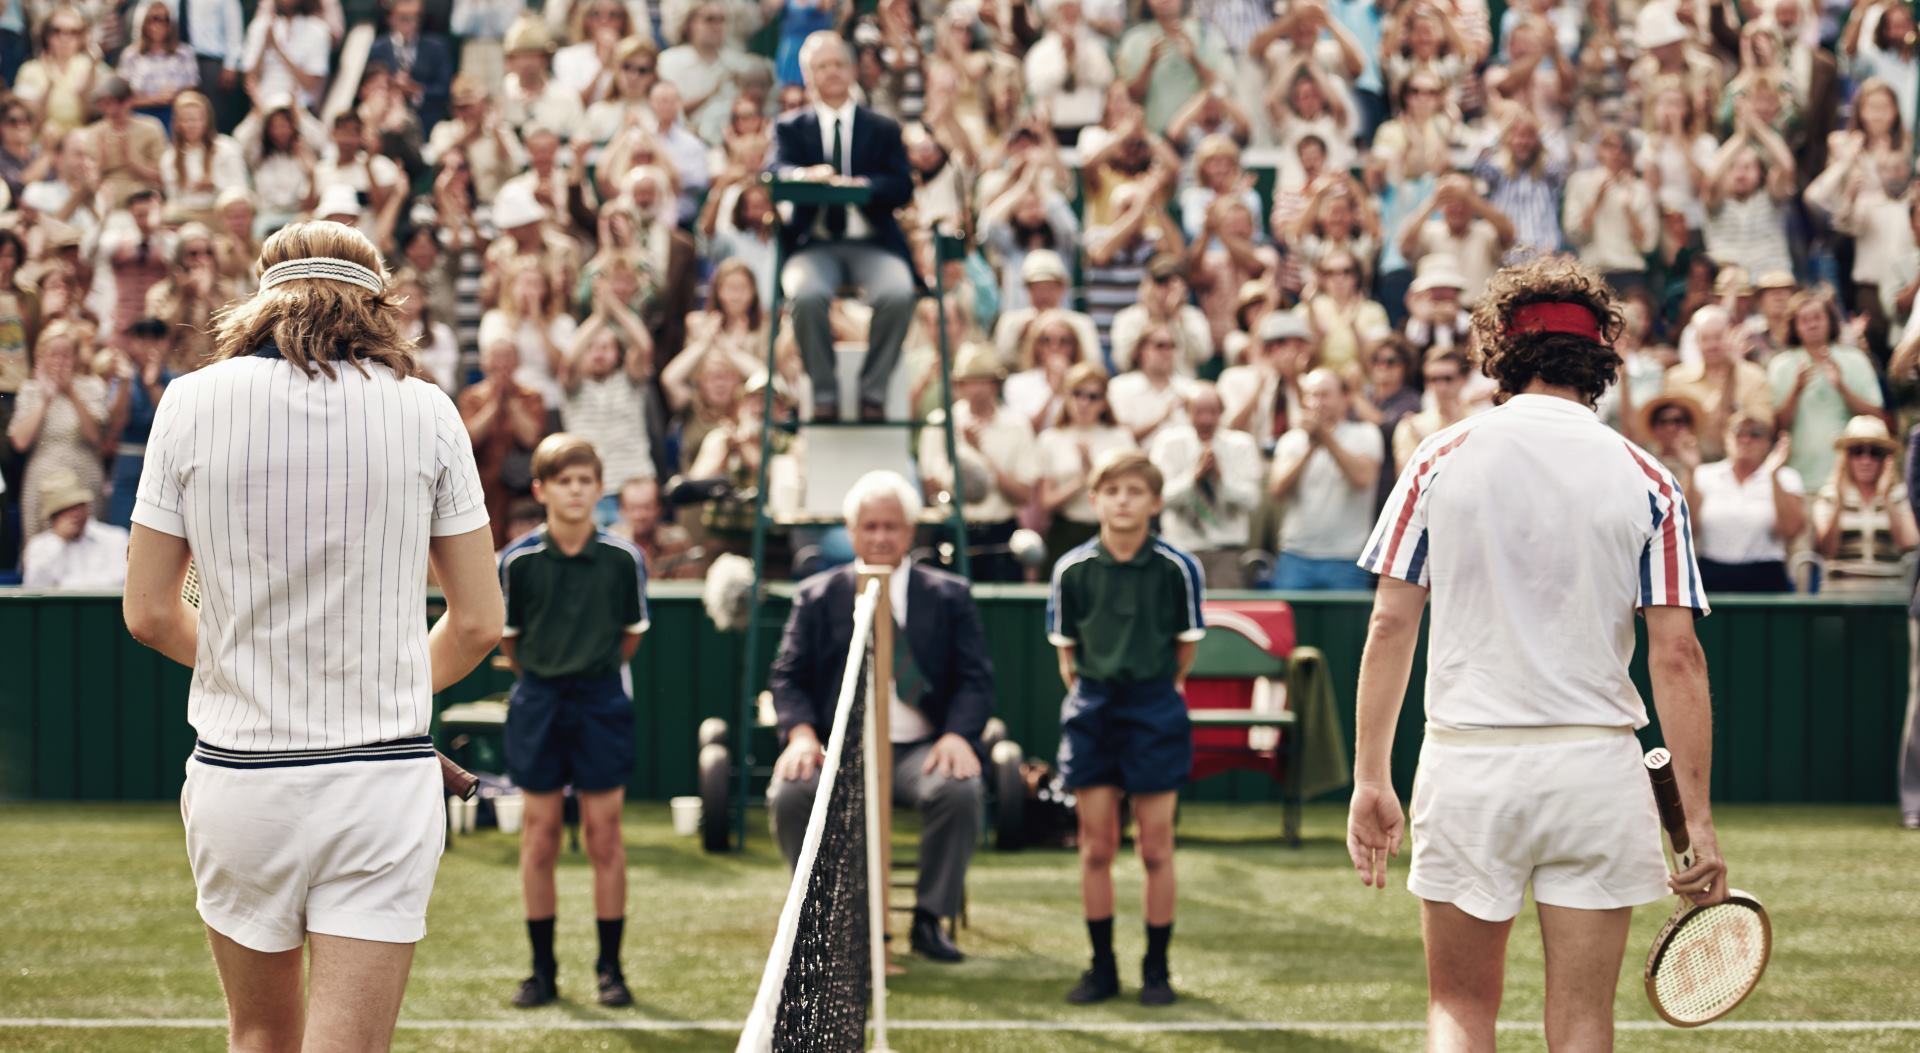 FOTO: VIDEO: Sportski film 'Borg/McEnroe' prikazuje se u kinima